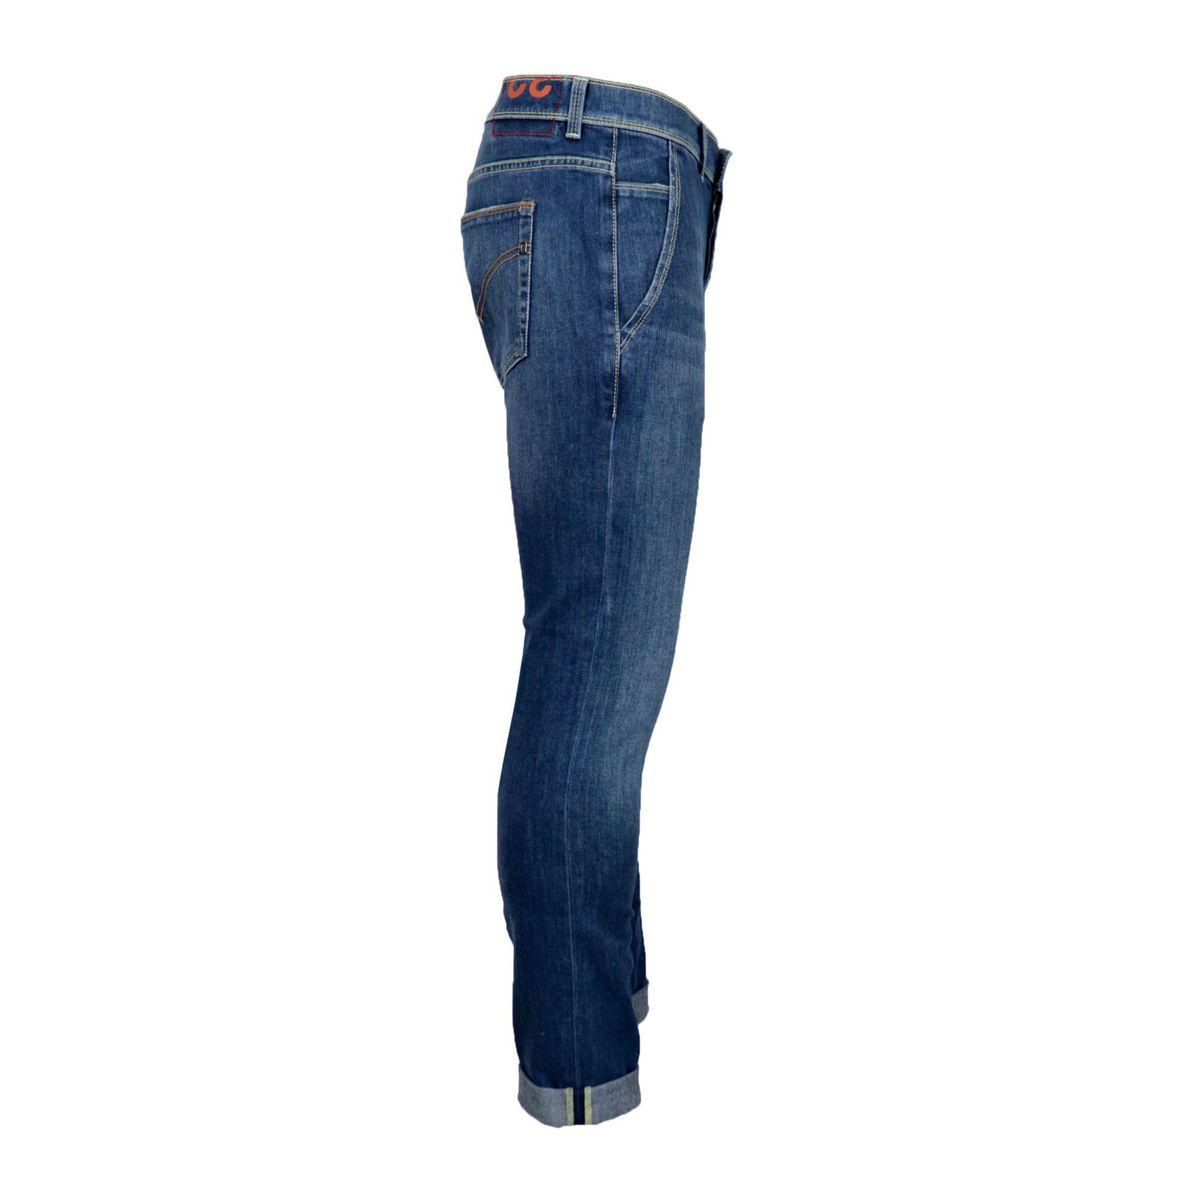 Konor jeans in medium denim with America pockets Denim Dondup